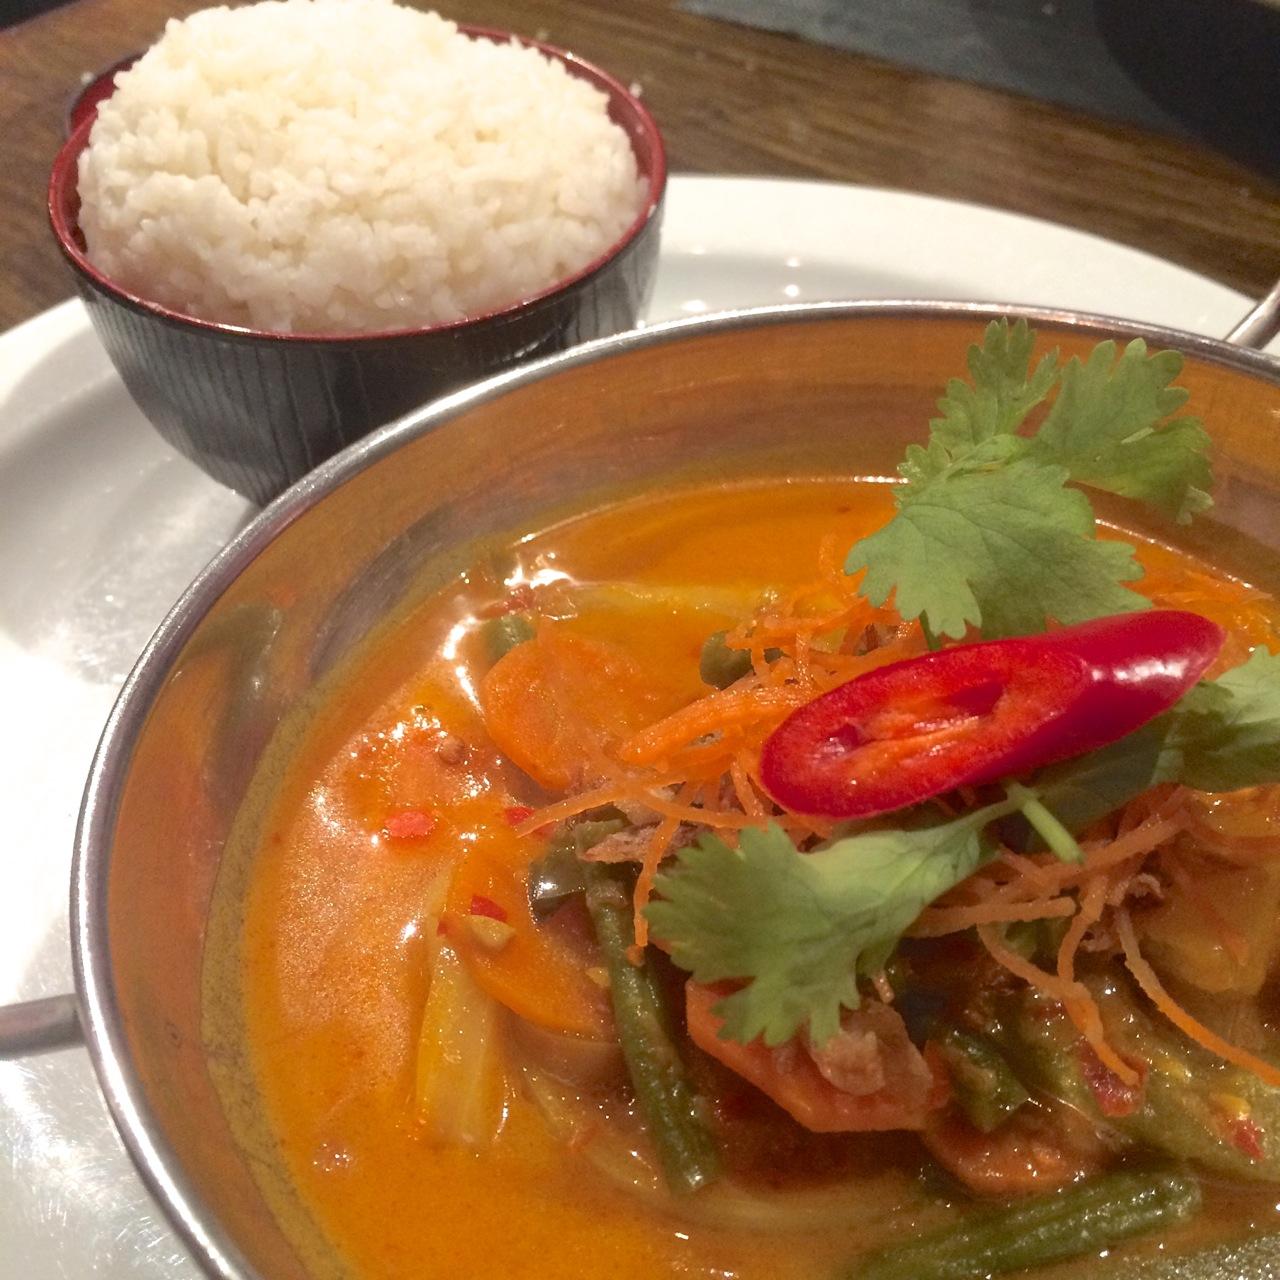 http://fatgayvegan.com/wp-content/uploads/2015/12/ning-coconut-soup.jpg